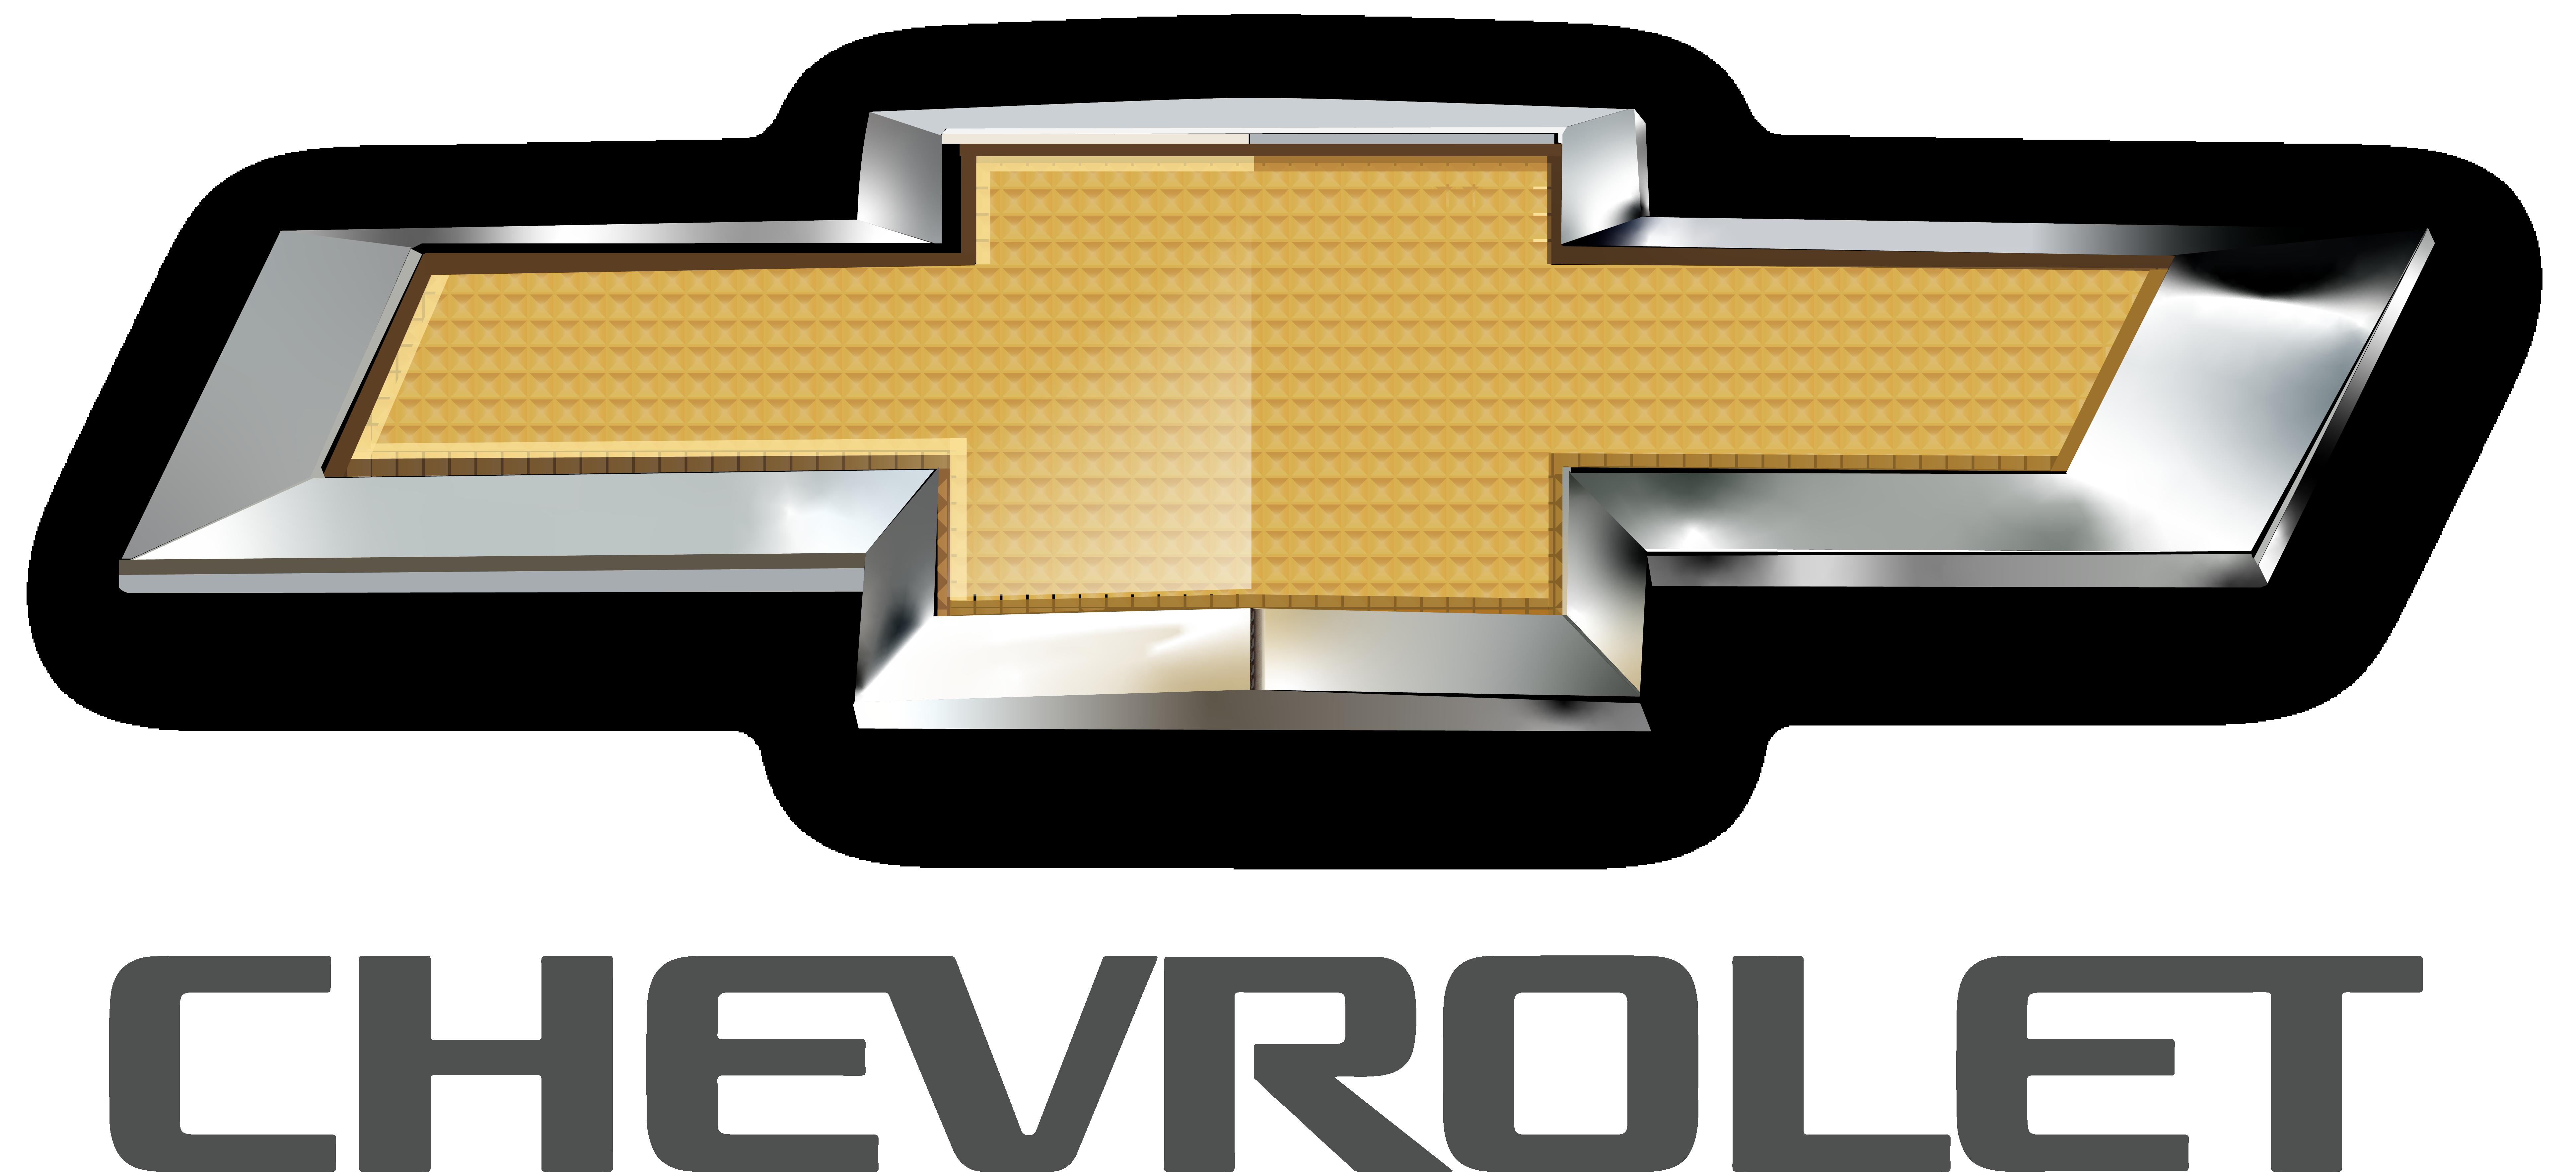 logo chevrolet png gratis